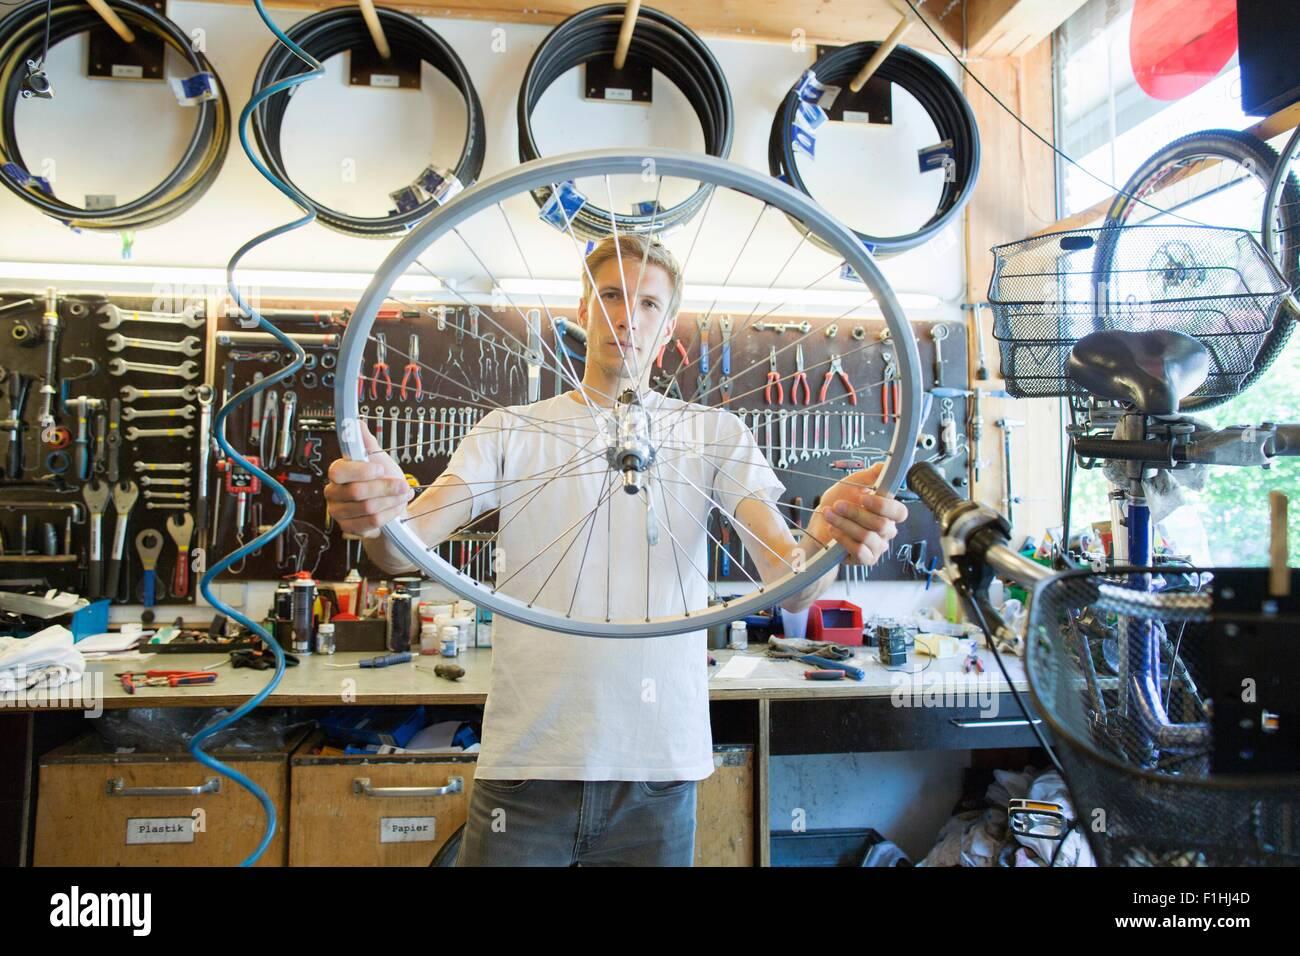 Mid adult man in repair shop looking through bicycle wheel Stock Photo